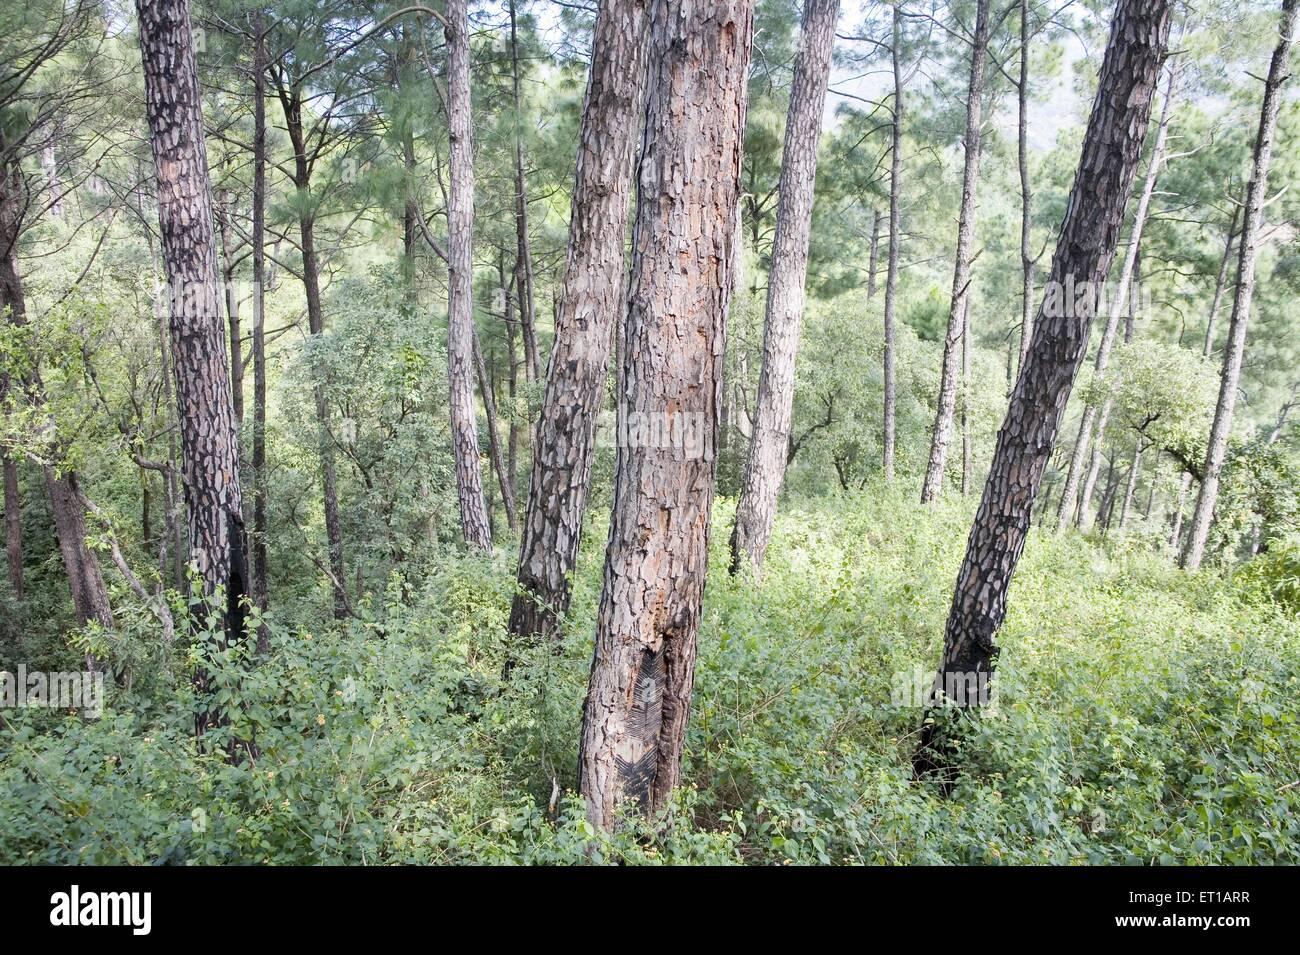 Pine trees forest in Himalaya ; Hamir pur ; Himachal Pradesh ; India - Stock Image